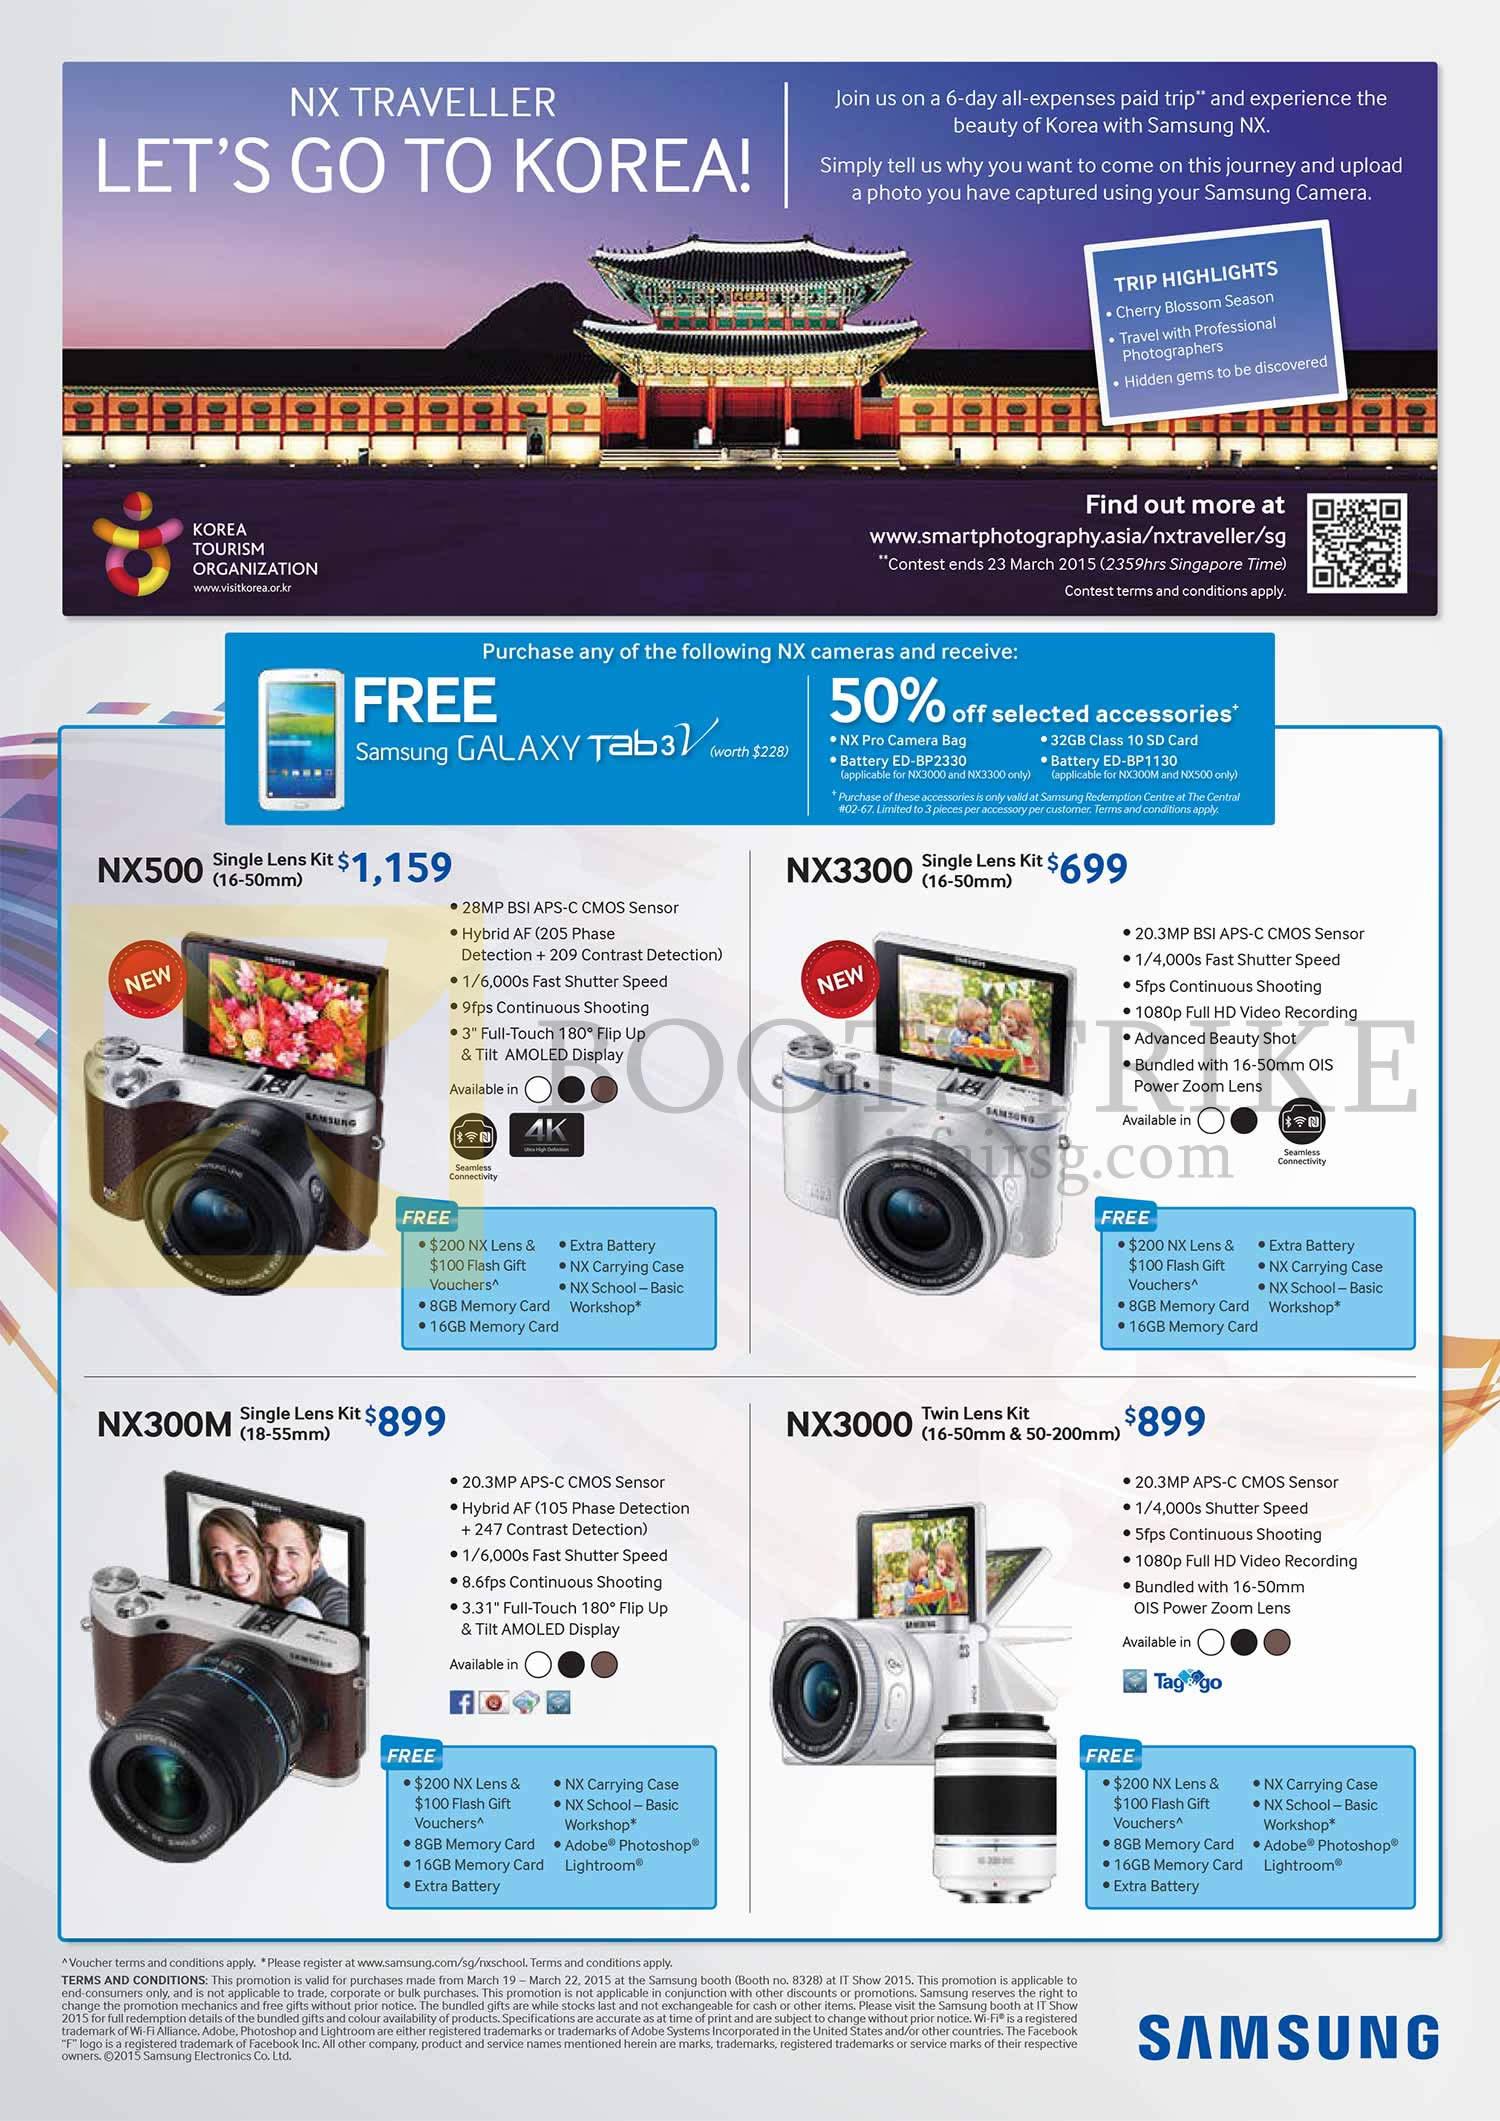 Samsung Digital Cameras NX500, NX3300, NX300M, NX3000